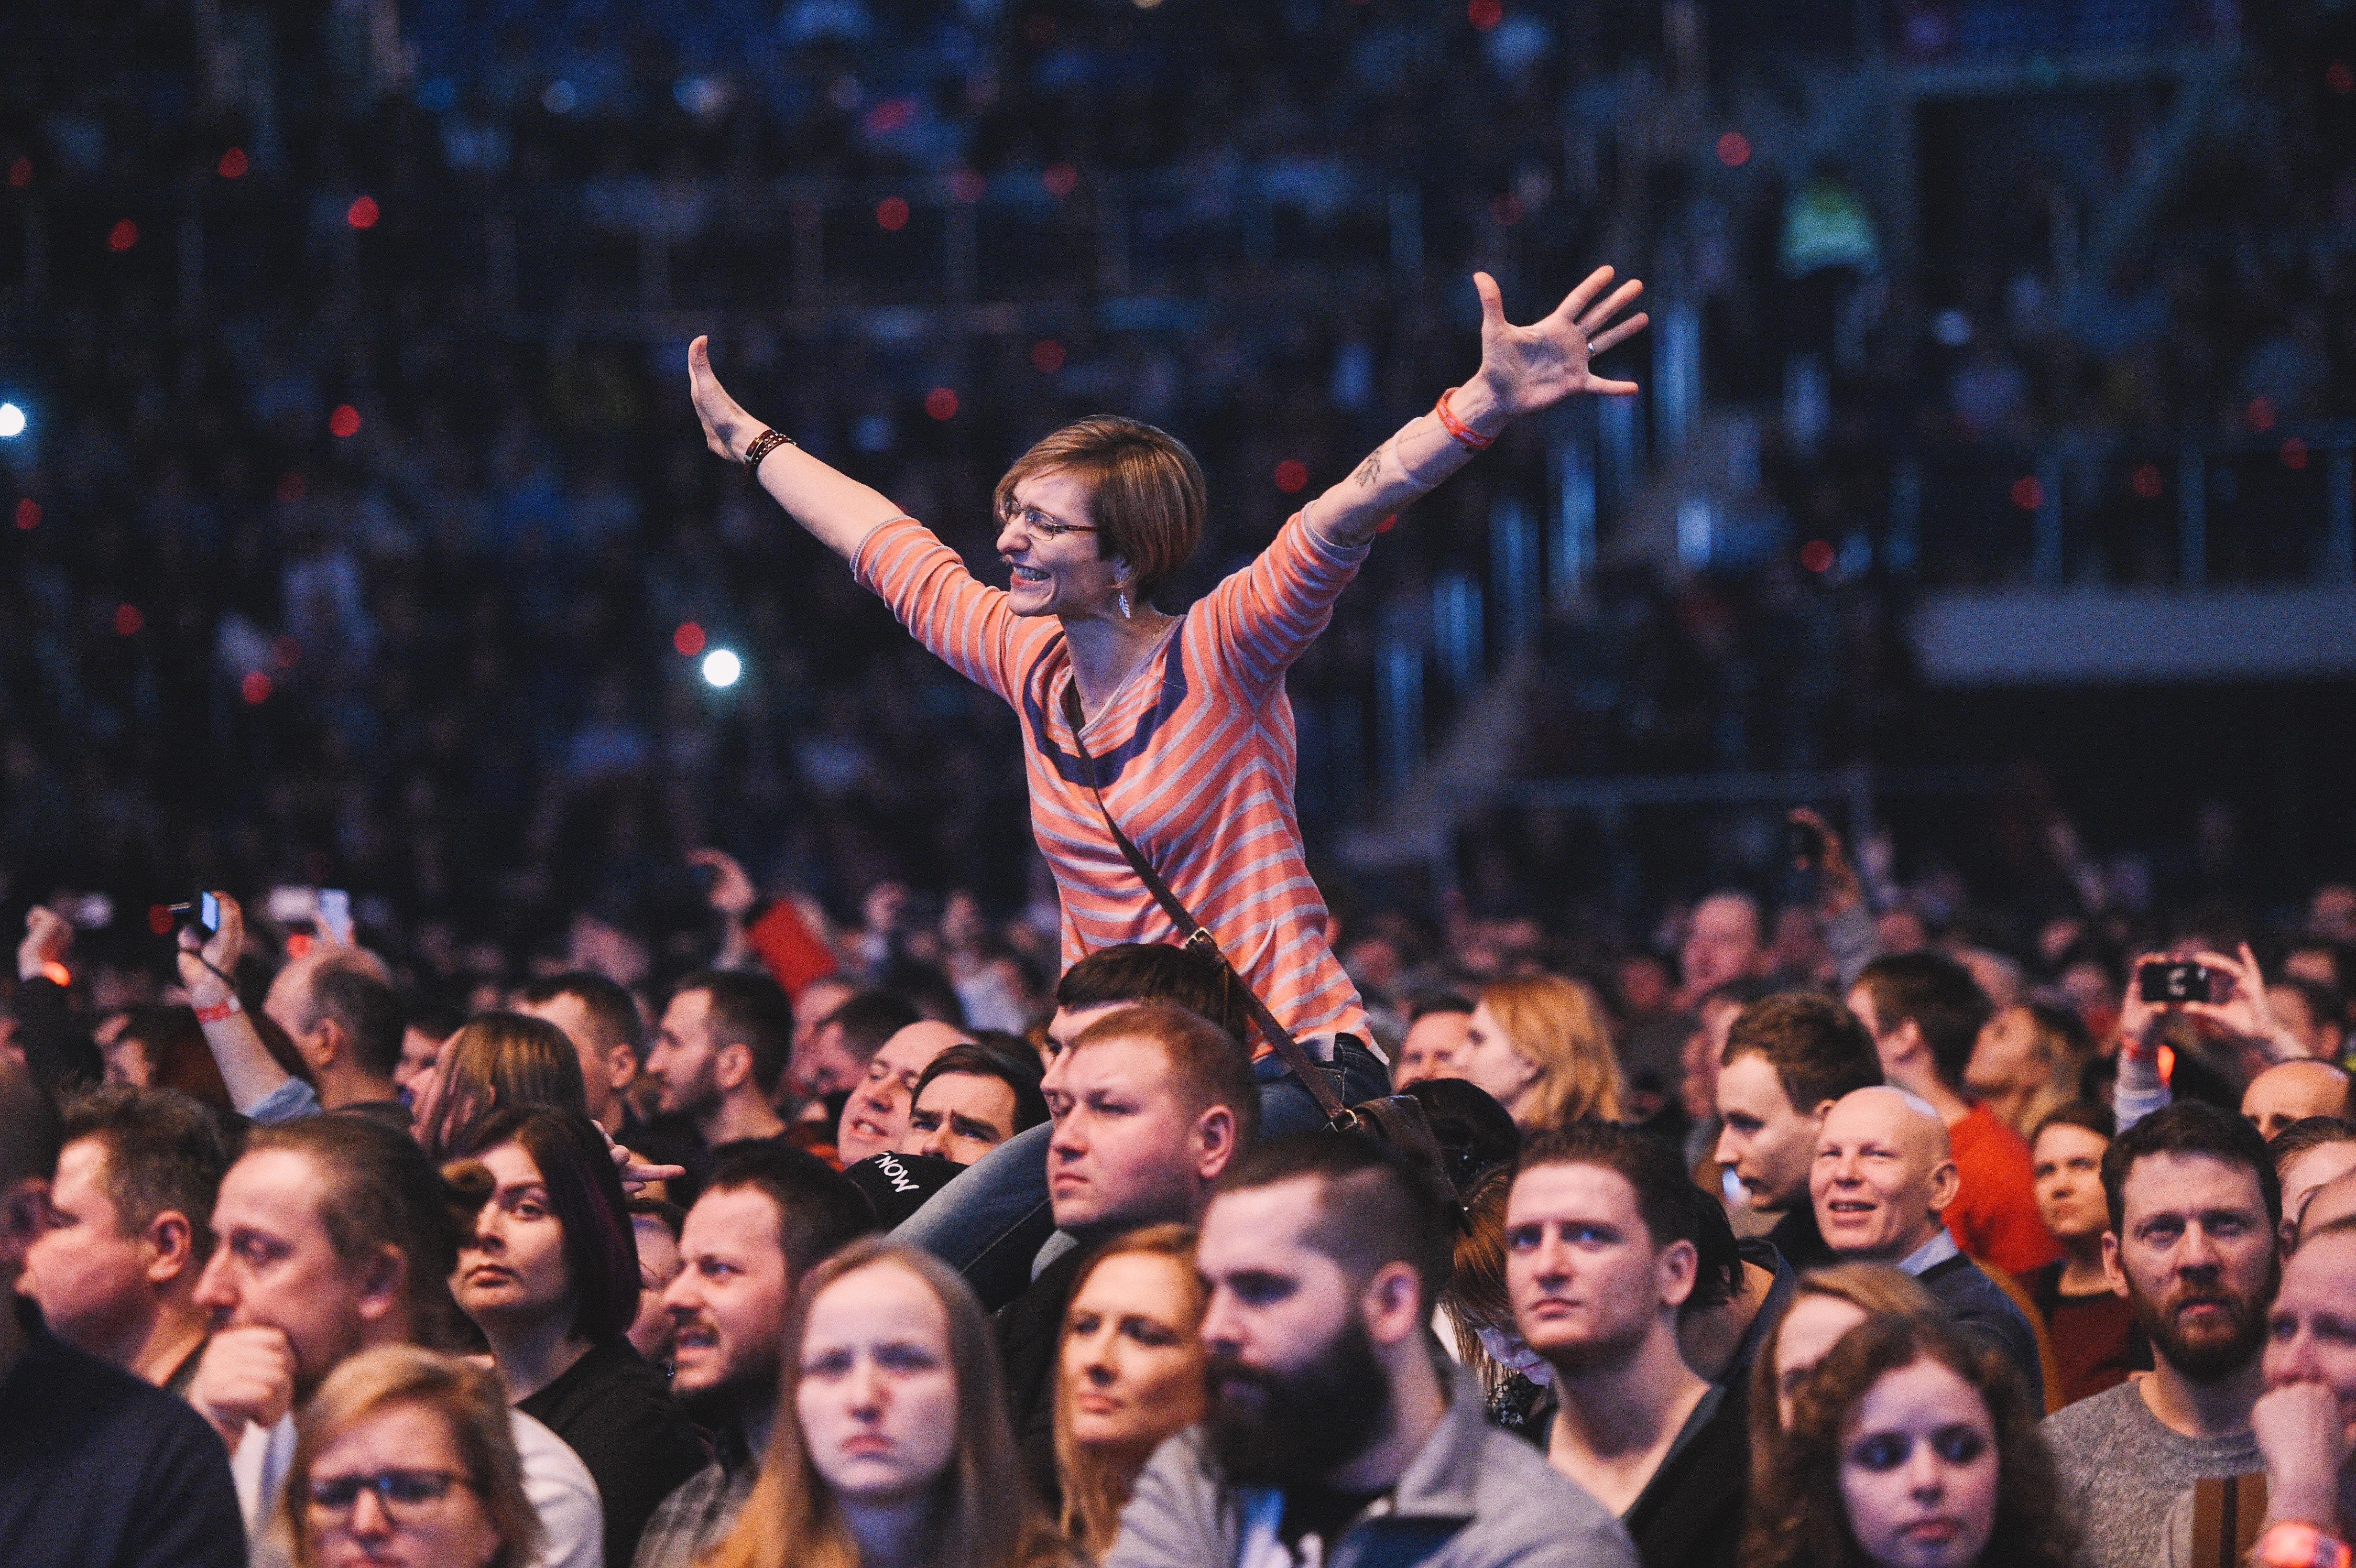 500+ Great Crowd Photos · Pexels · Free Stock Photos